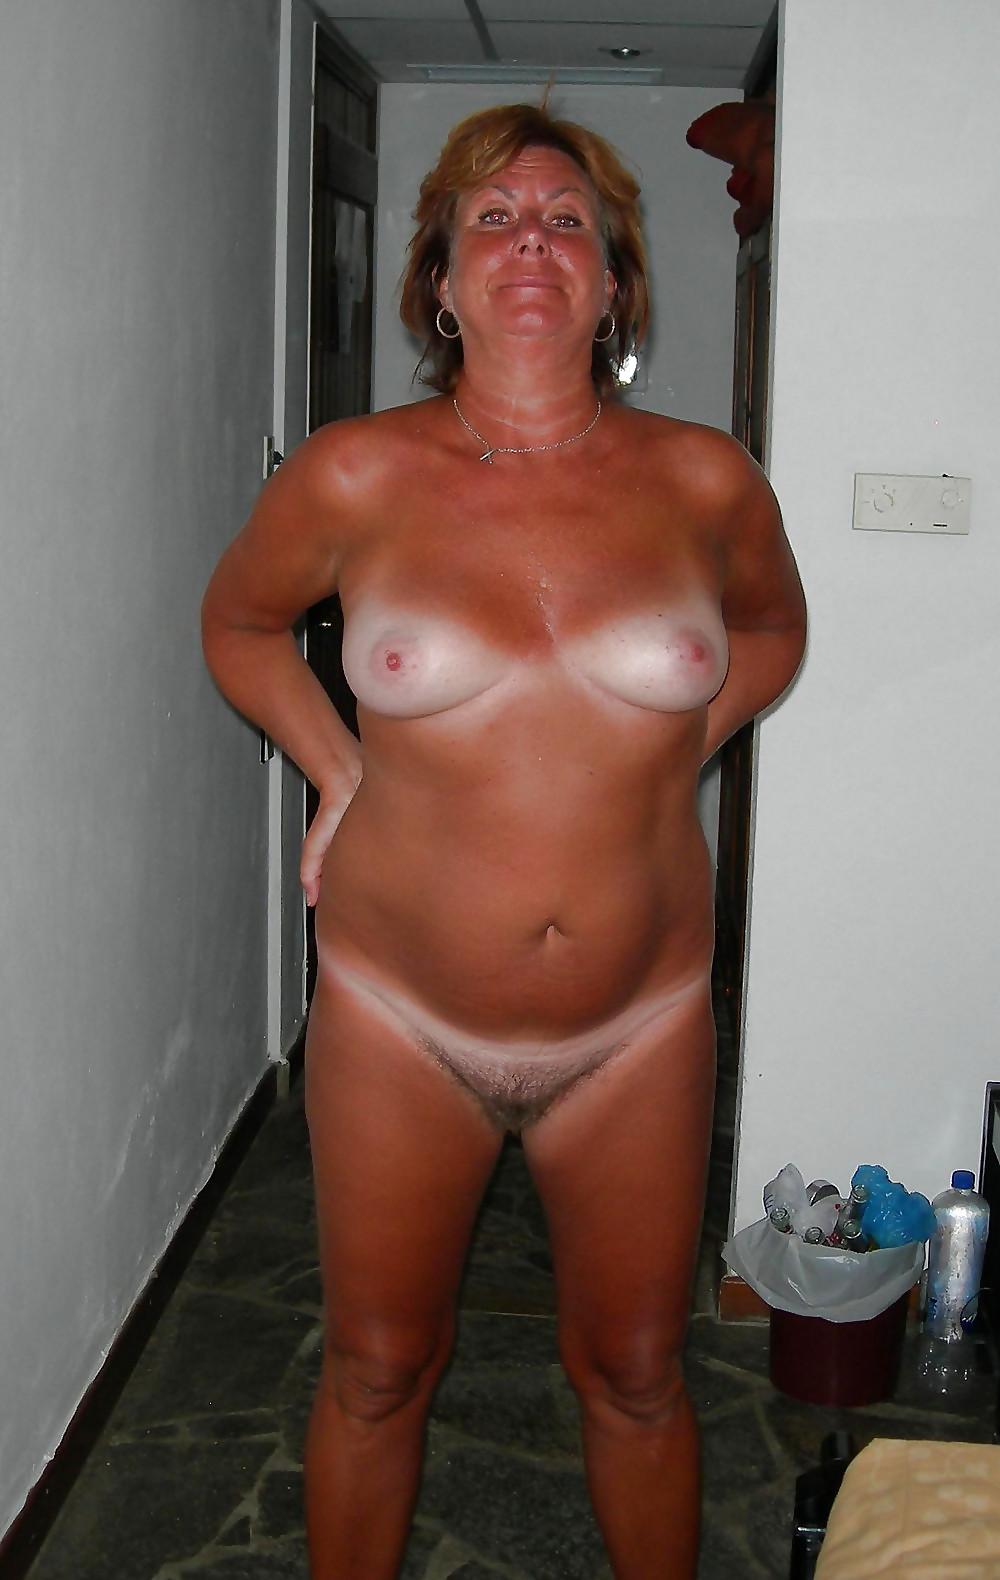 New Sex Images Pivot for swinging shower door